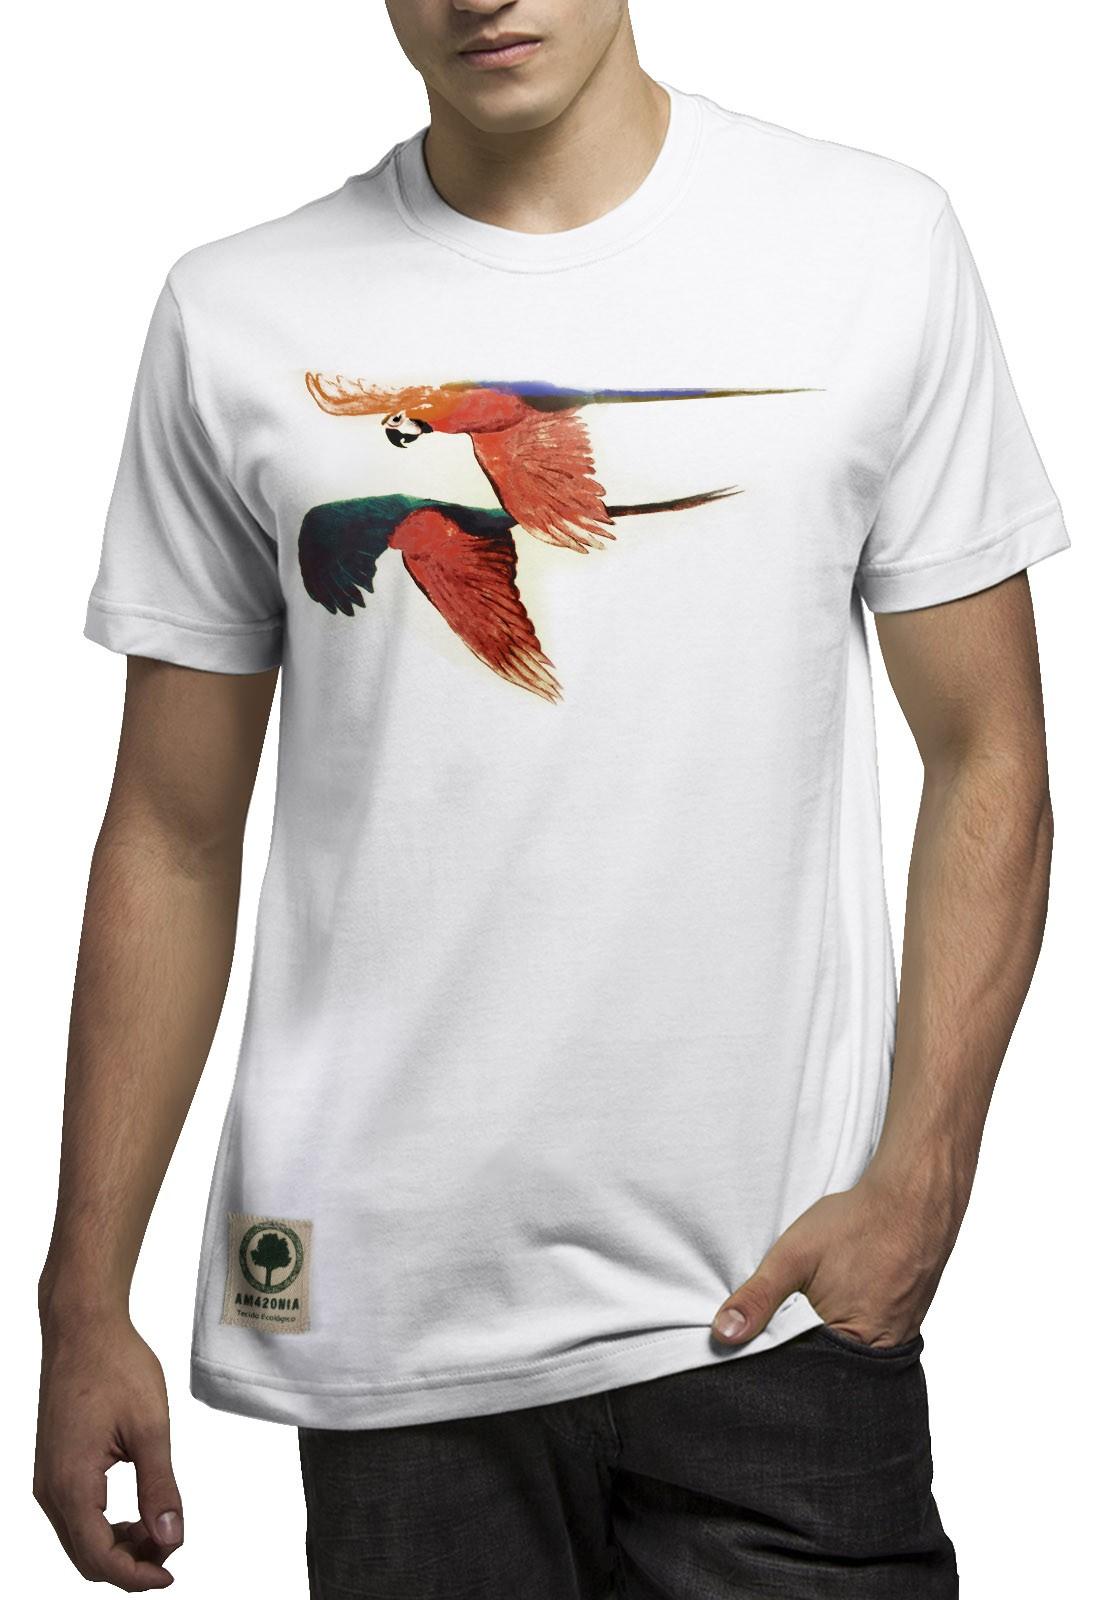 Camiseta Amazônia Araras Voando - Branco